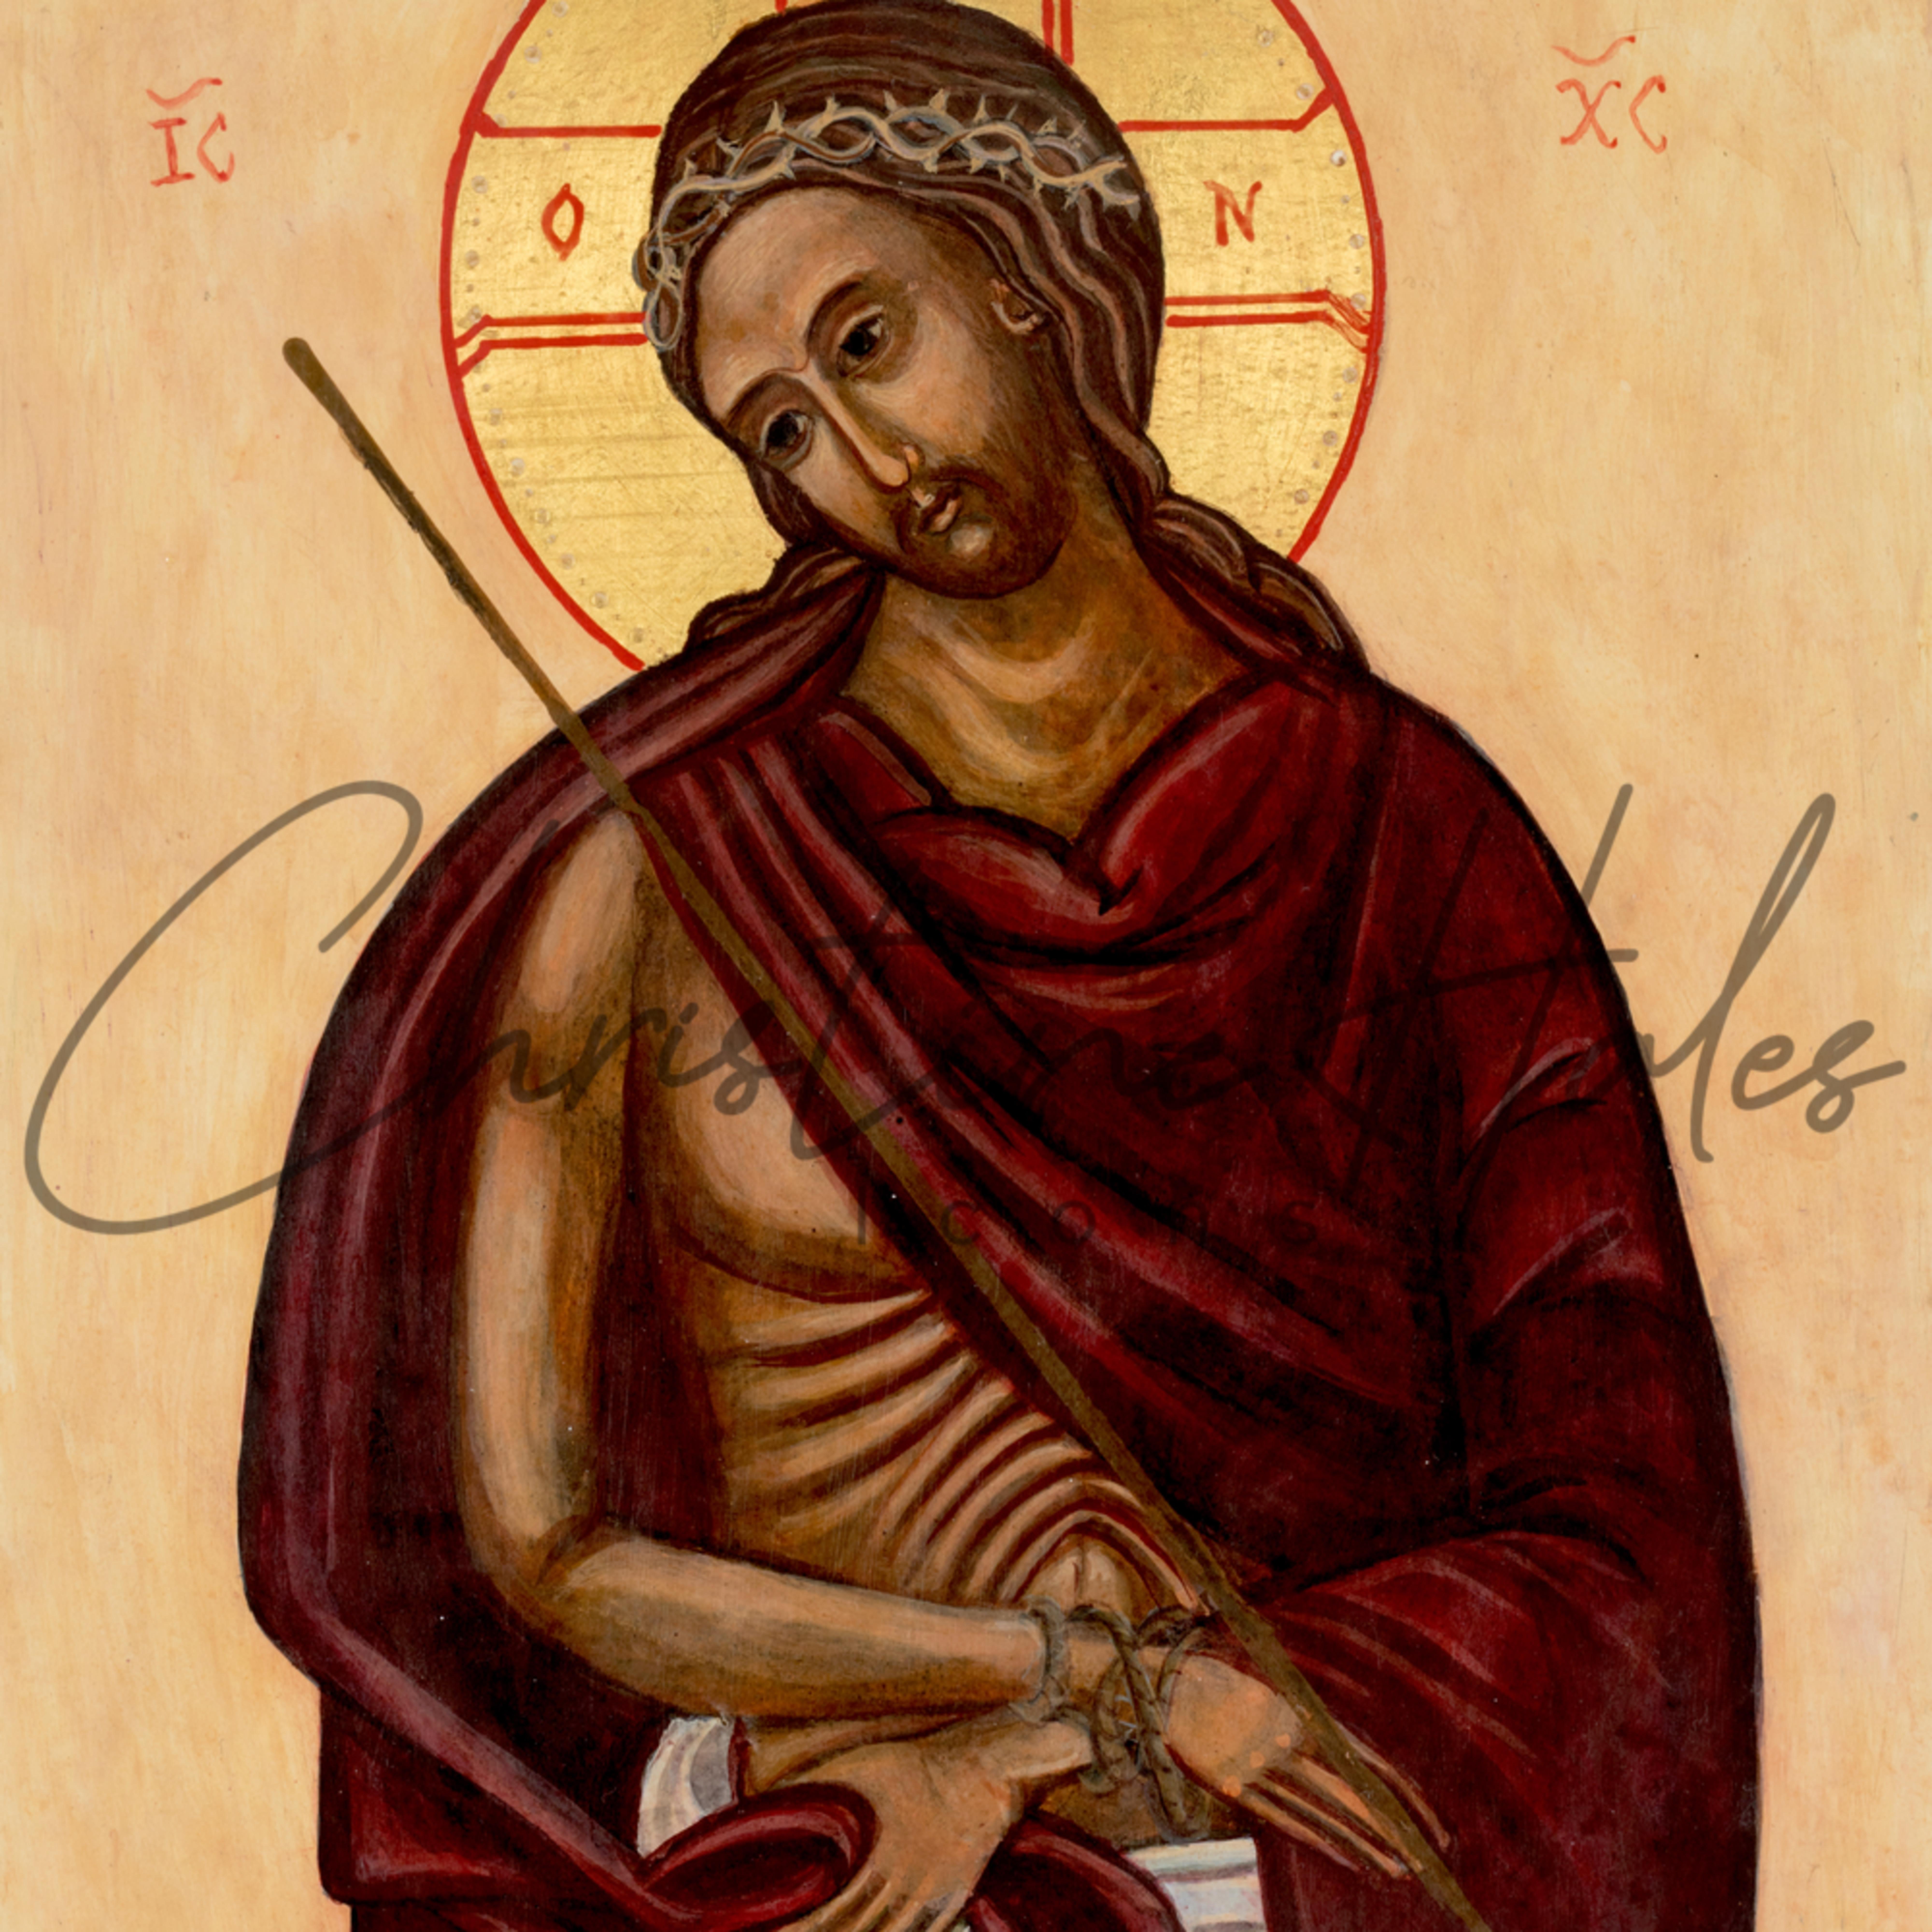 Christ the bridegroom azpvgs